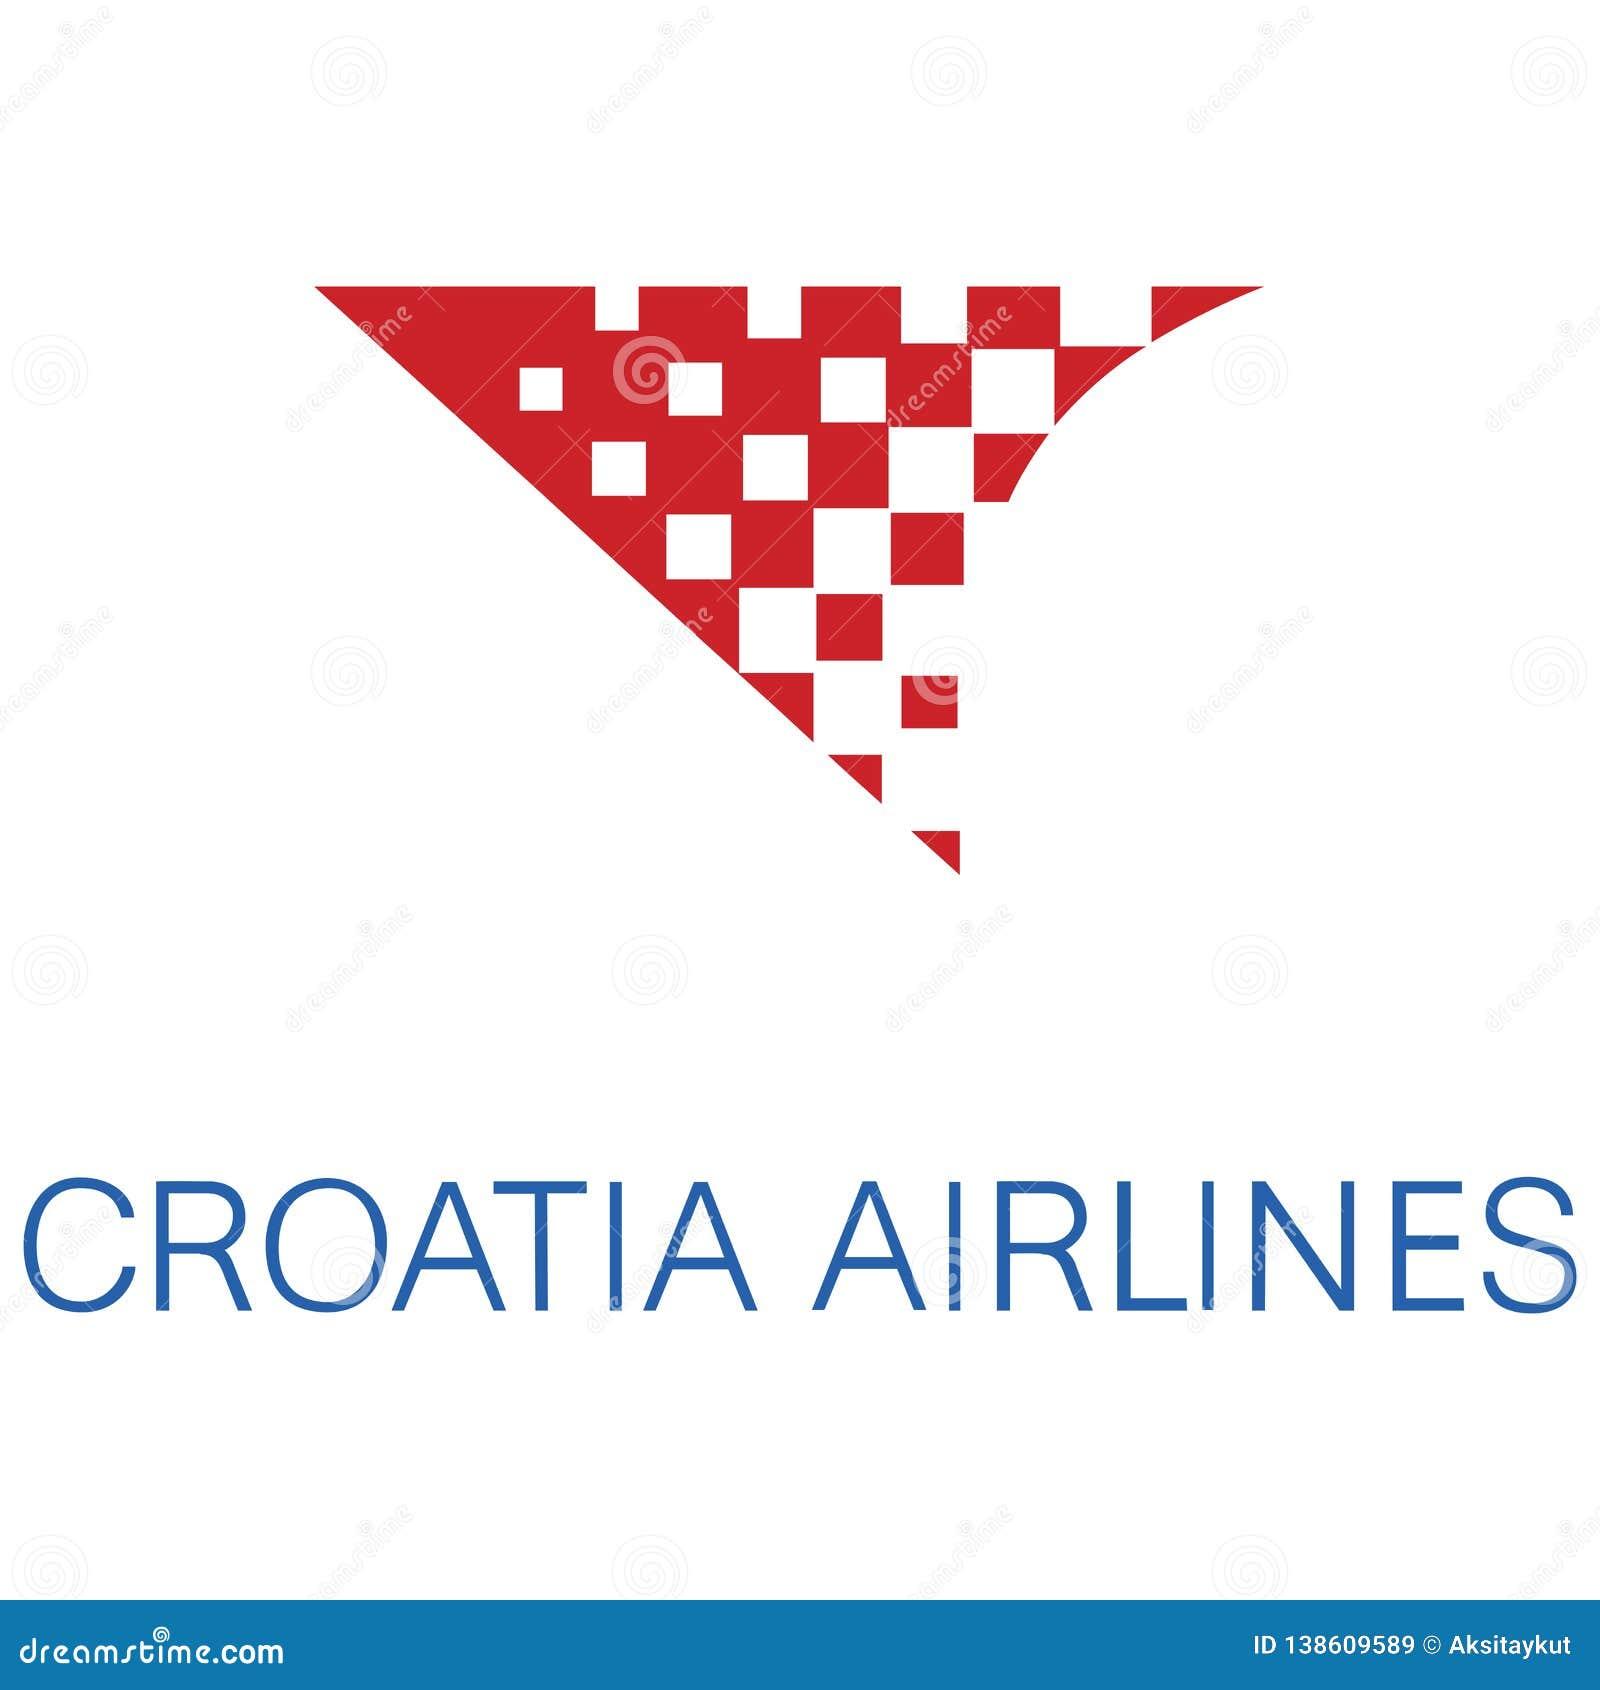 Croatia Airlines logo ikona